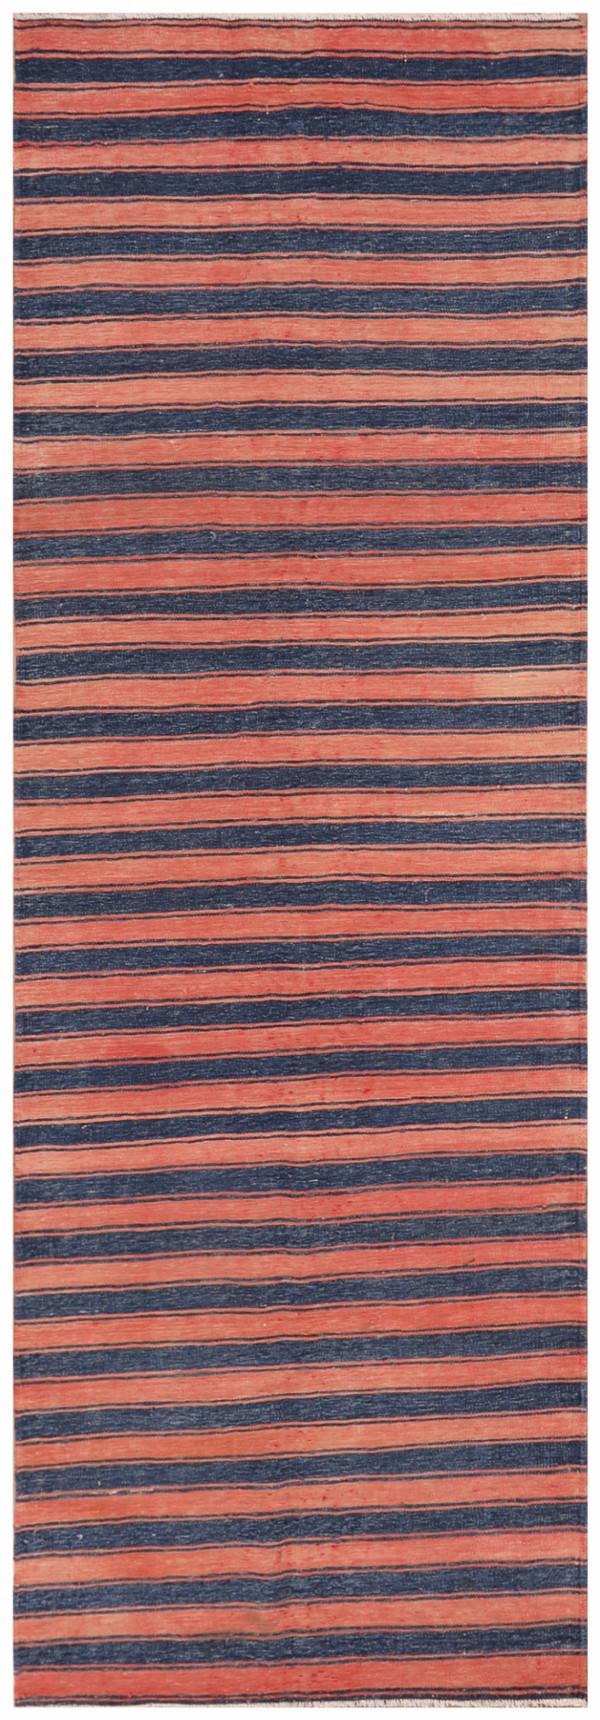 #51876 Vintage Persian Kilim